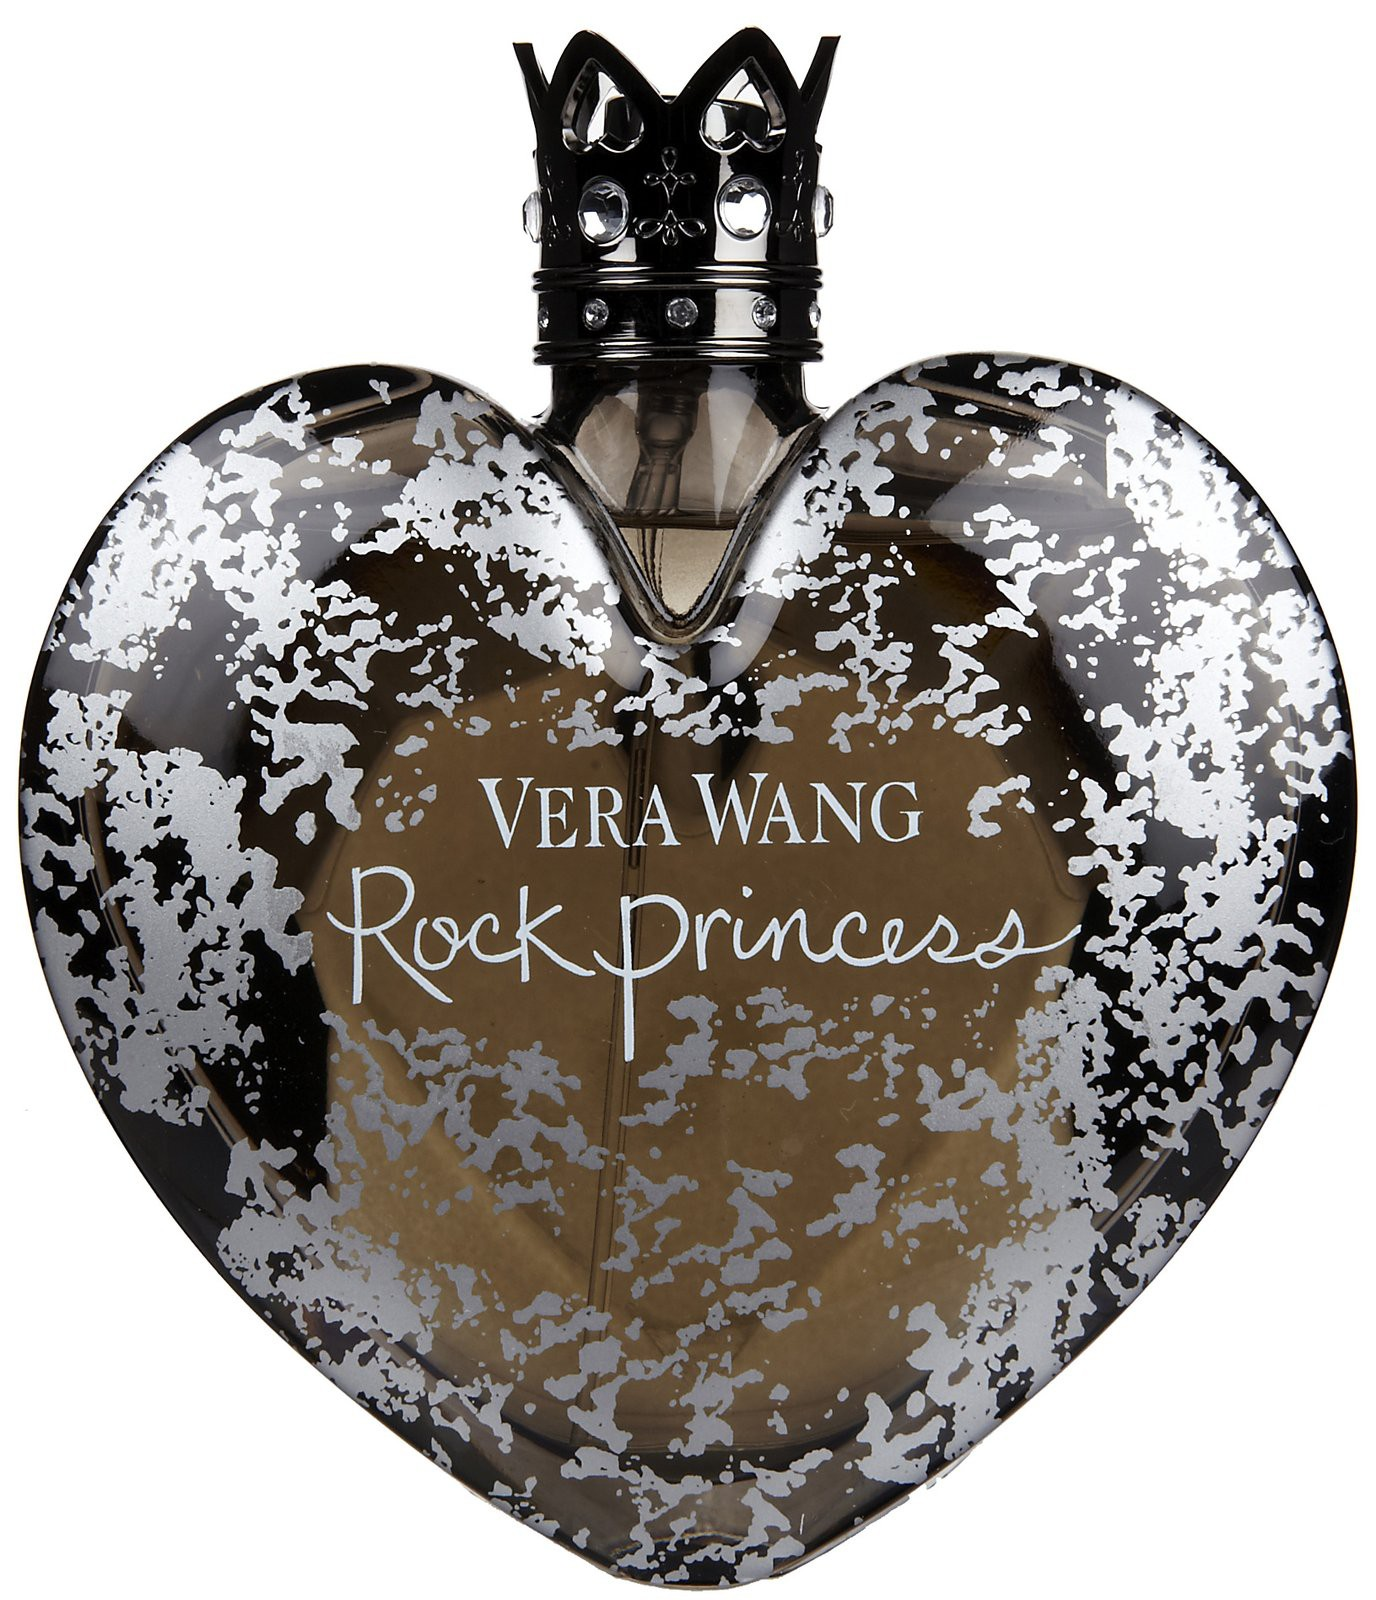 Vera Wang Rock Princess аромат для женщин